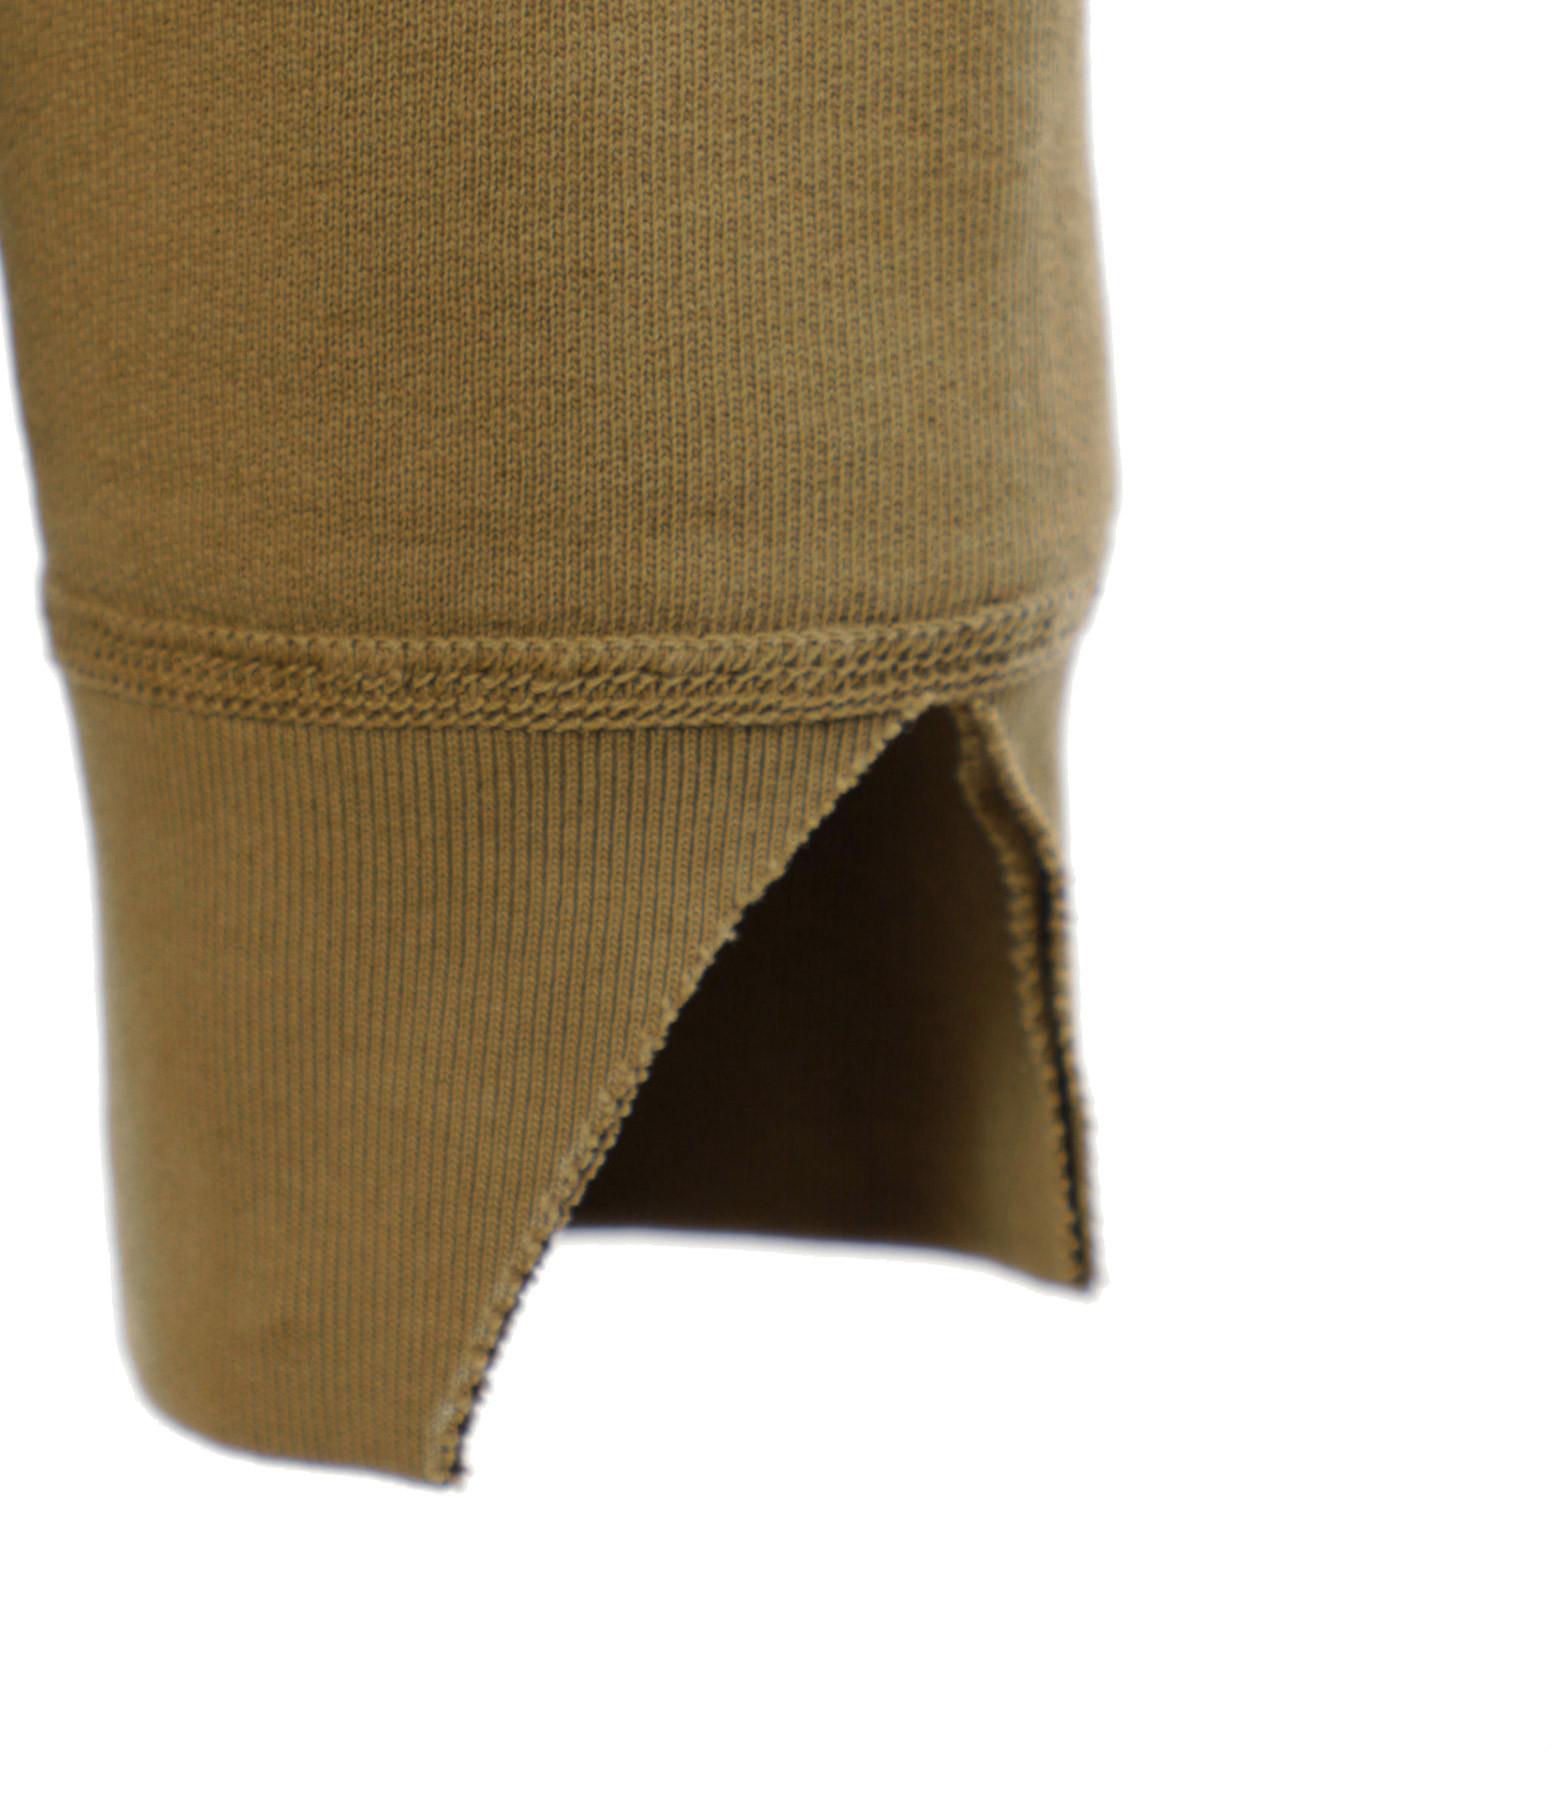 NILI LOTAN - Sweatshirt Luka Coton Vert Army